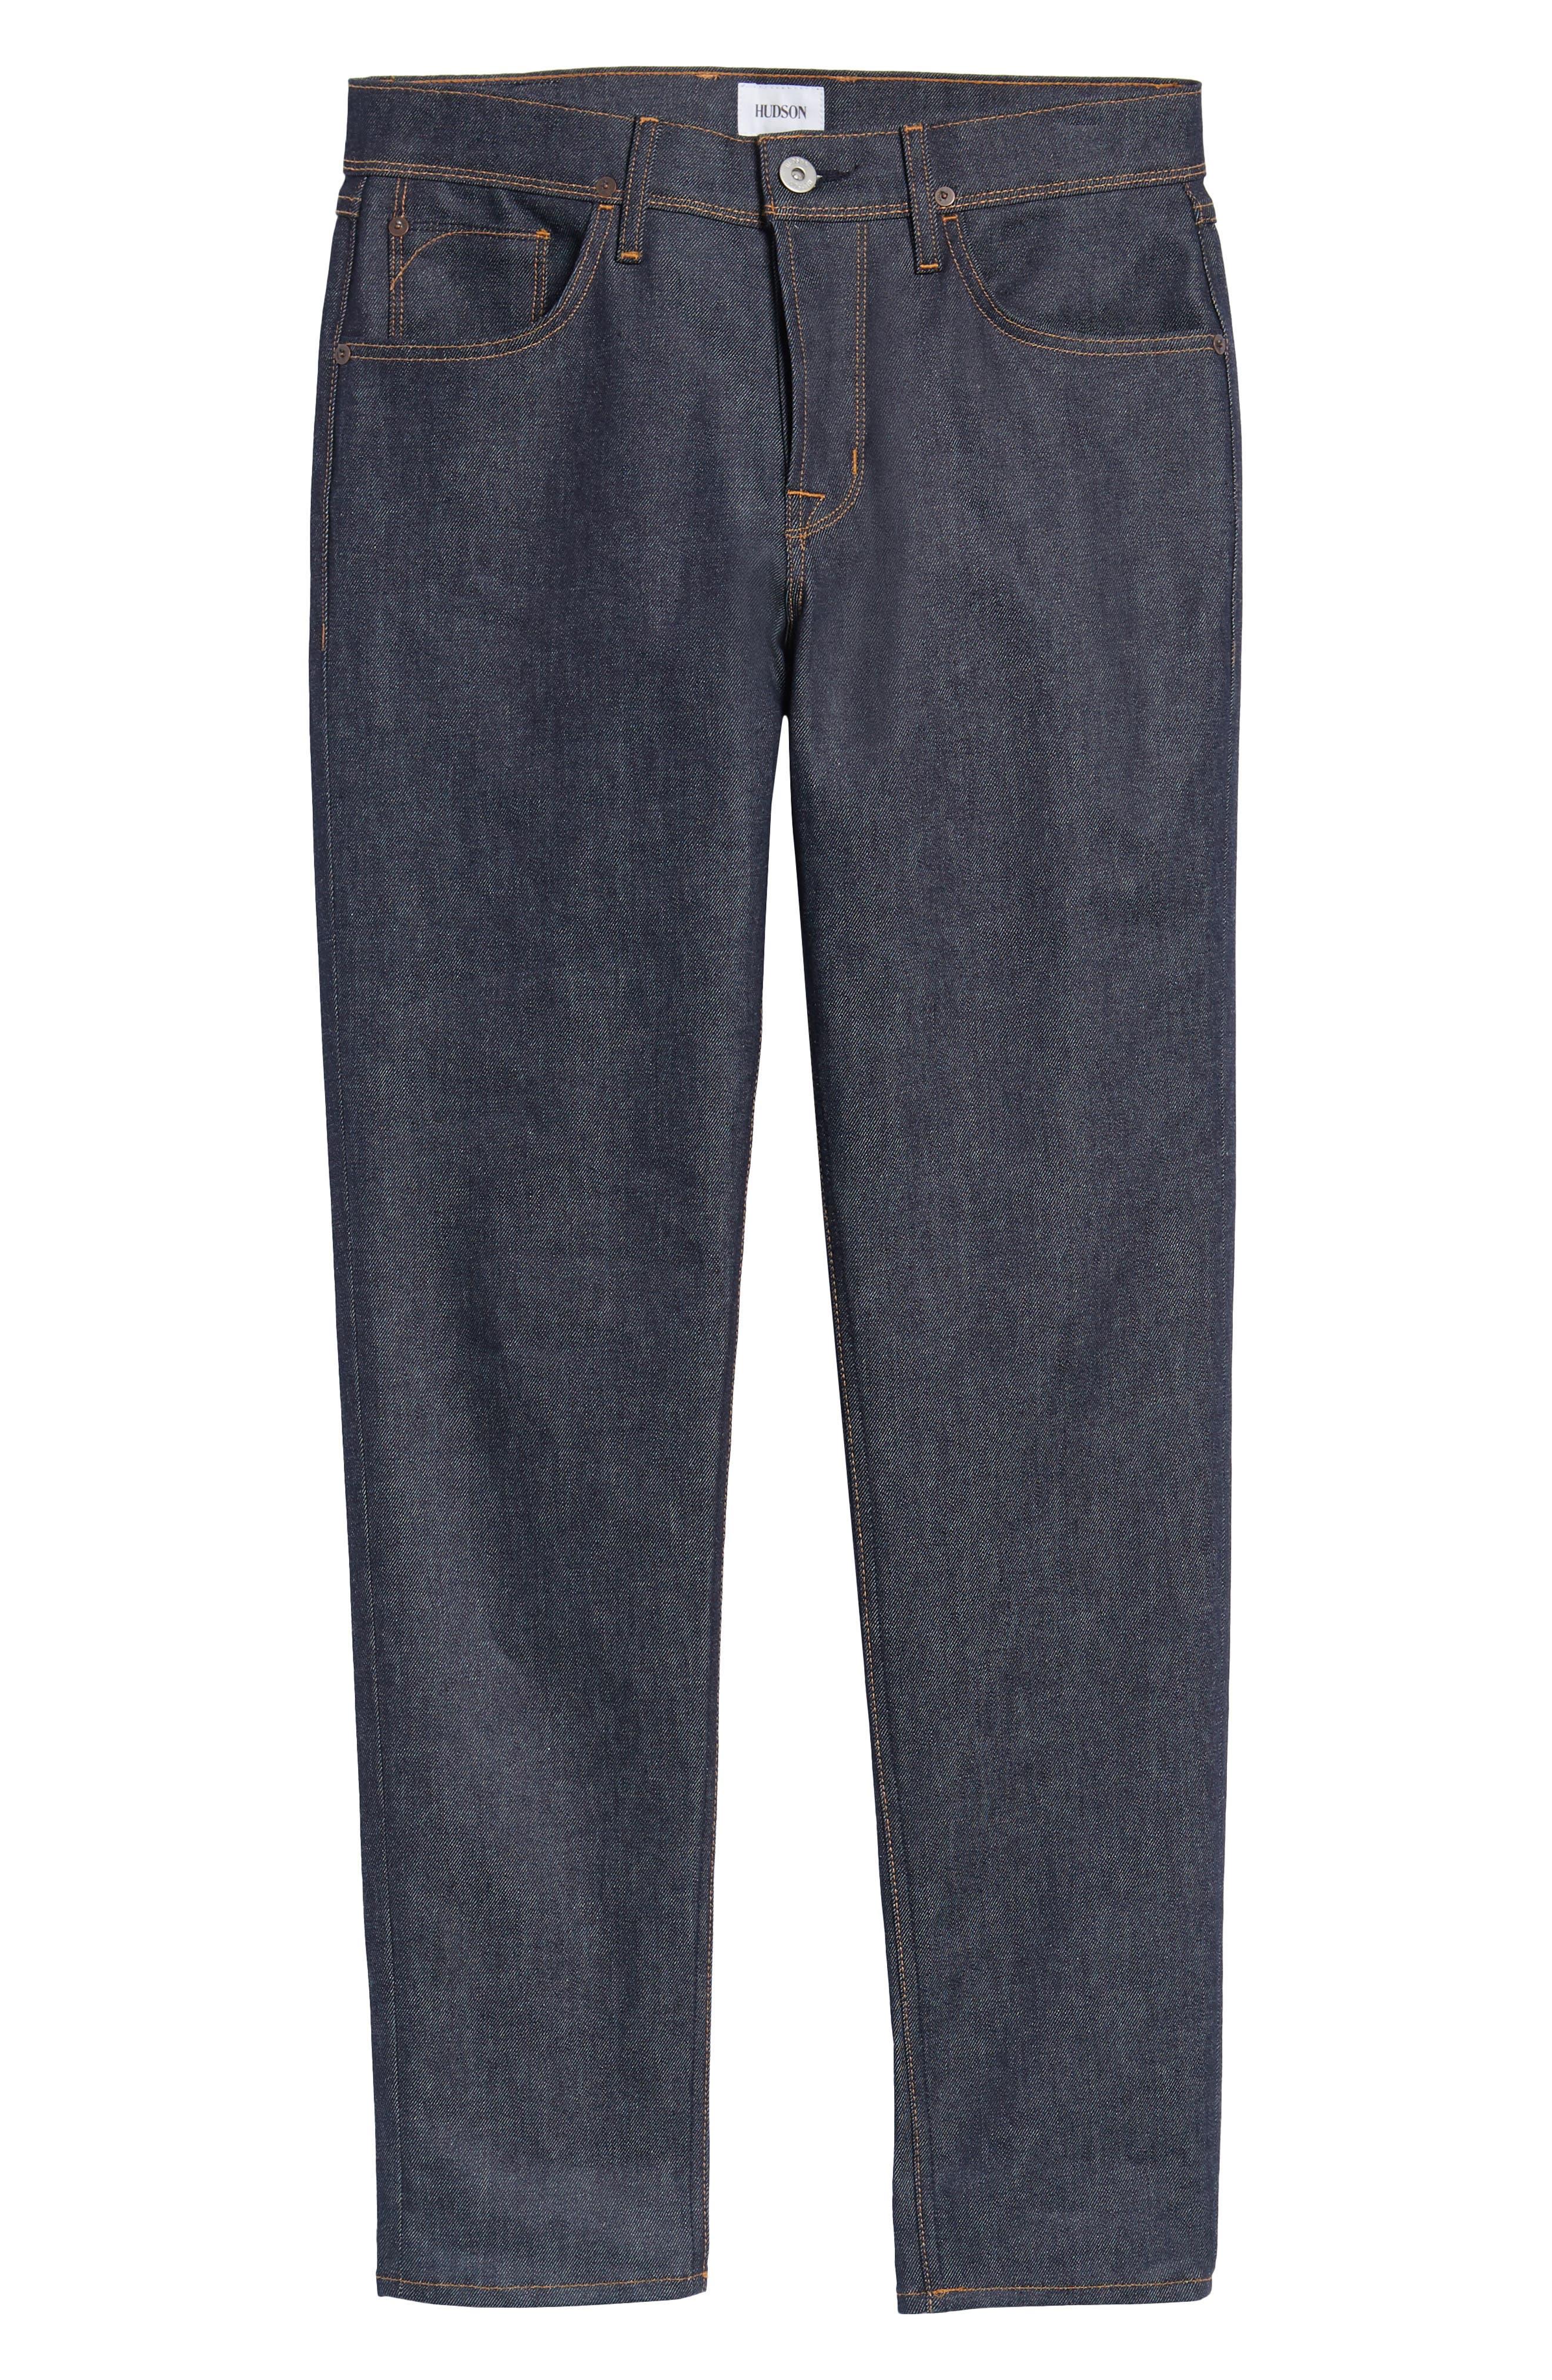 Sartor Skinny Fit Jeans,                             Alternate thumbnail 6, color,                             RAW